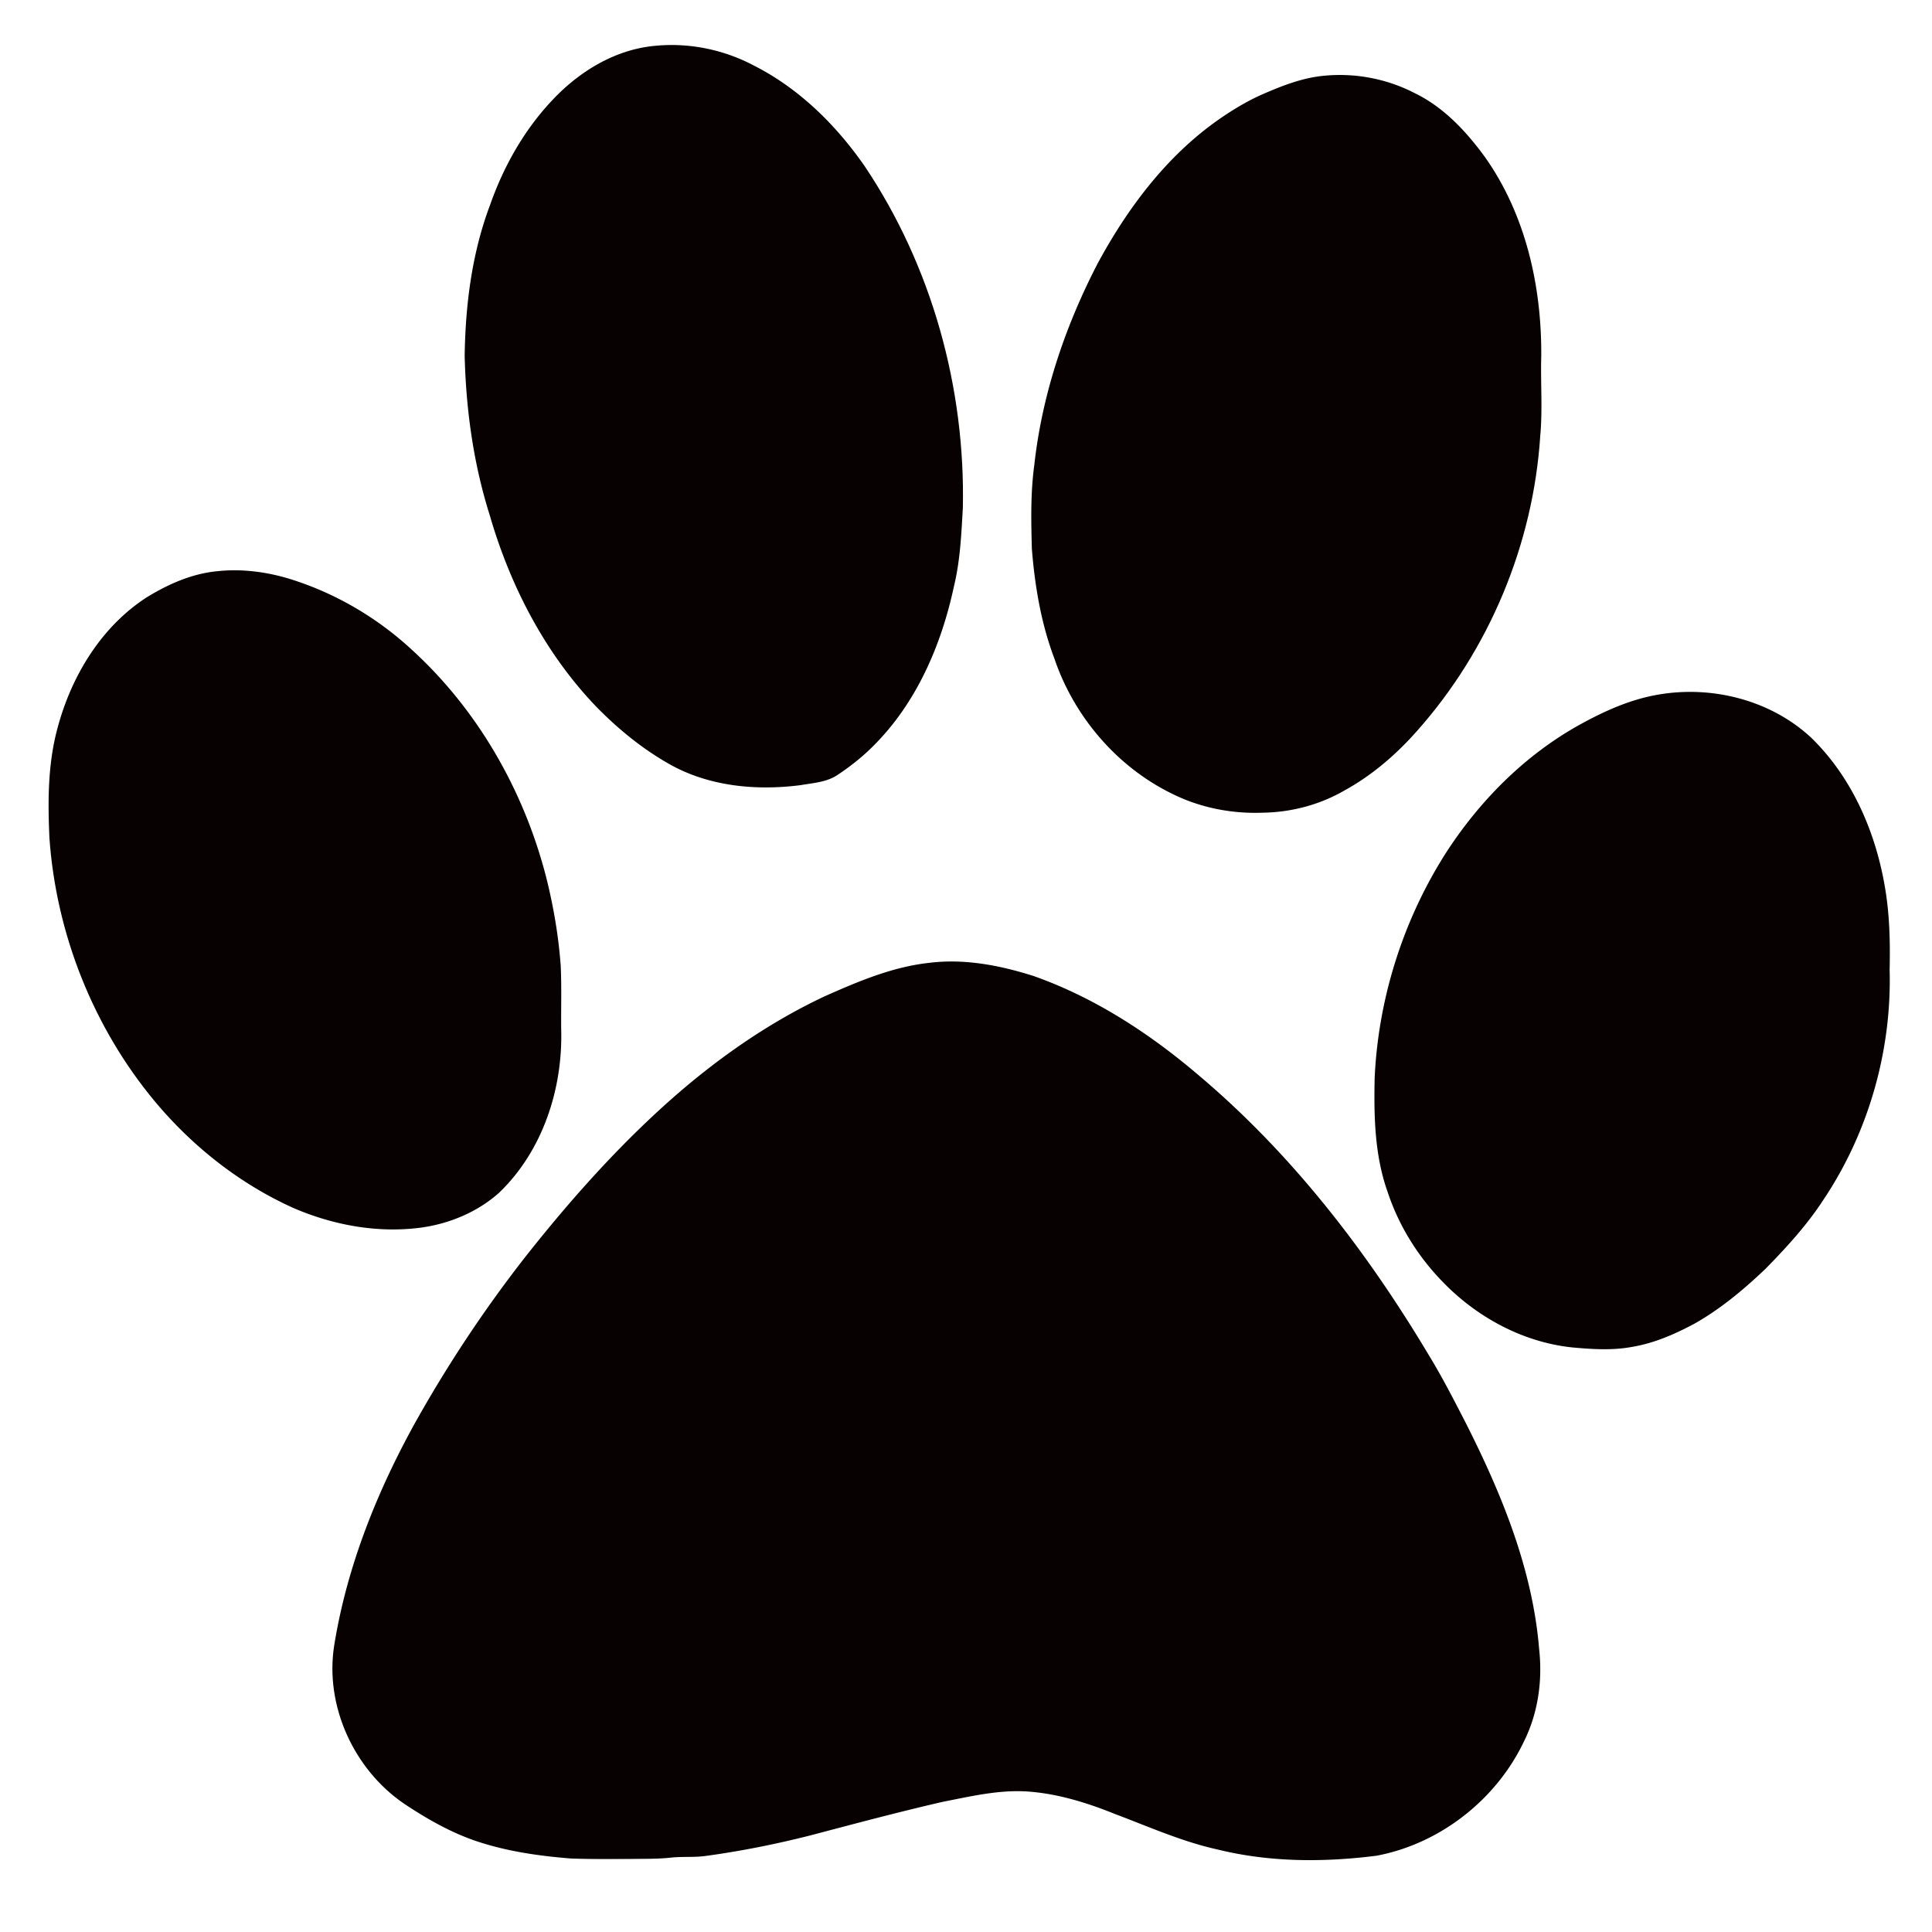 Cougar Paw Clip Art